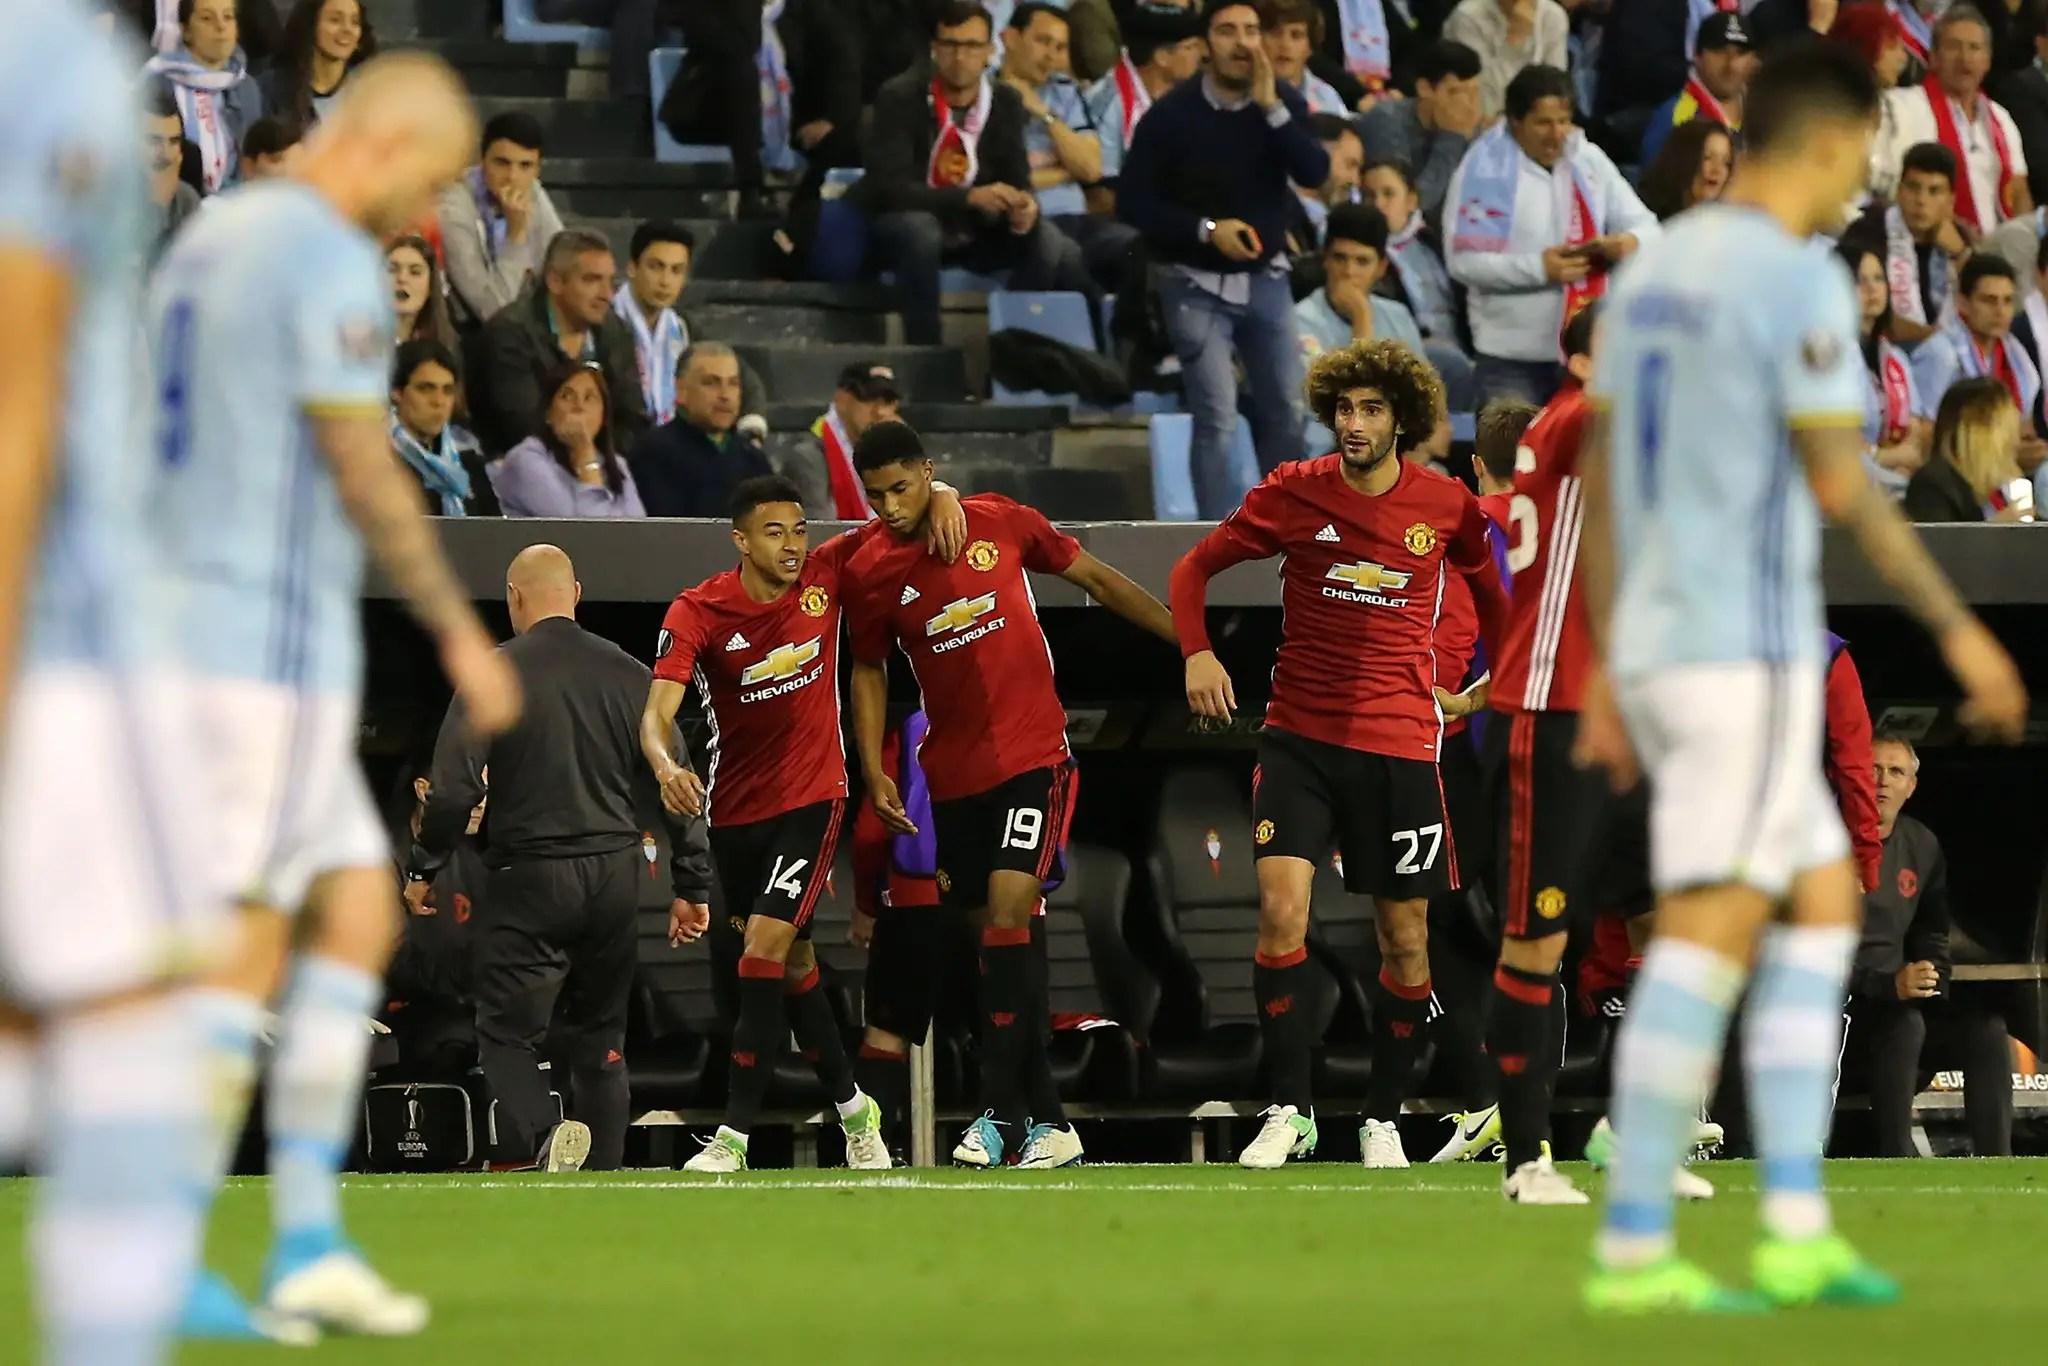 Europa: Rashford Scores Stunner Vs Celta As United Take First Leg Advantage